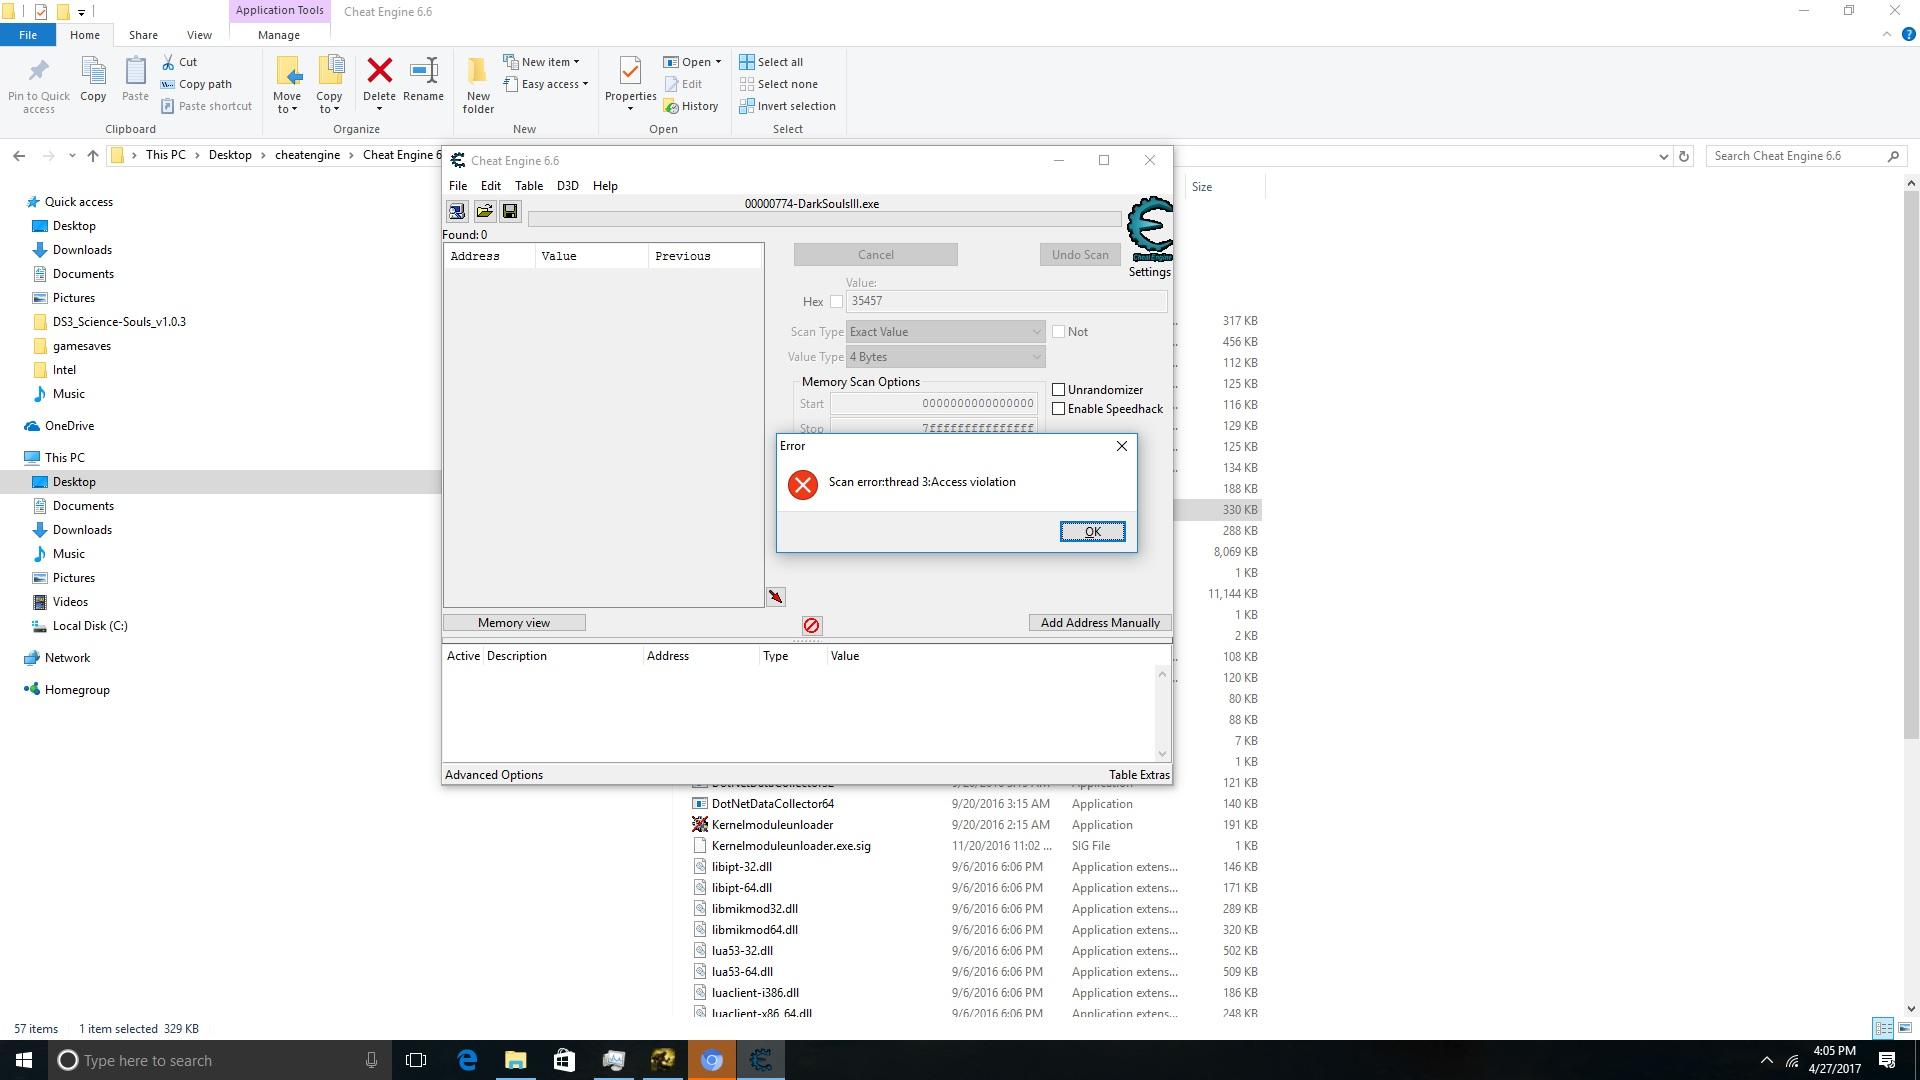 Cheat Engine :: View topic - Access Violation 3 error on